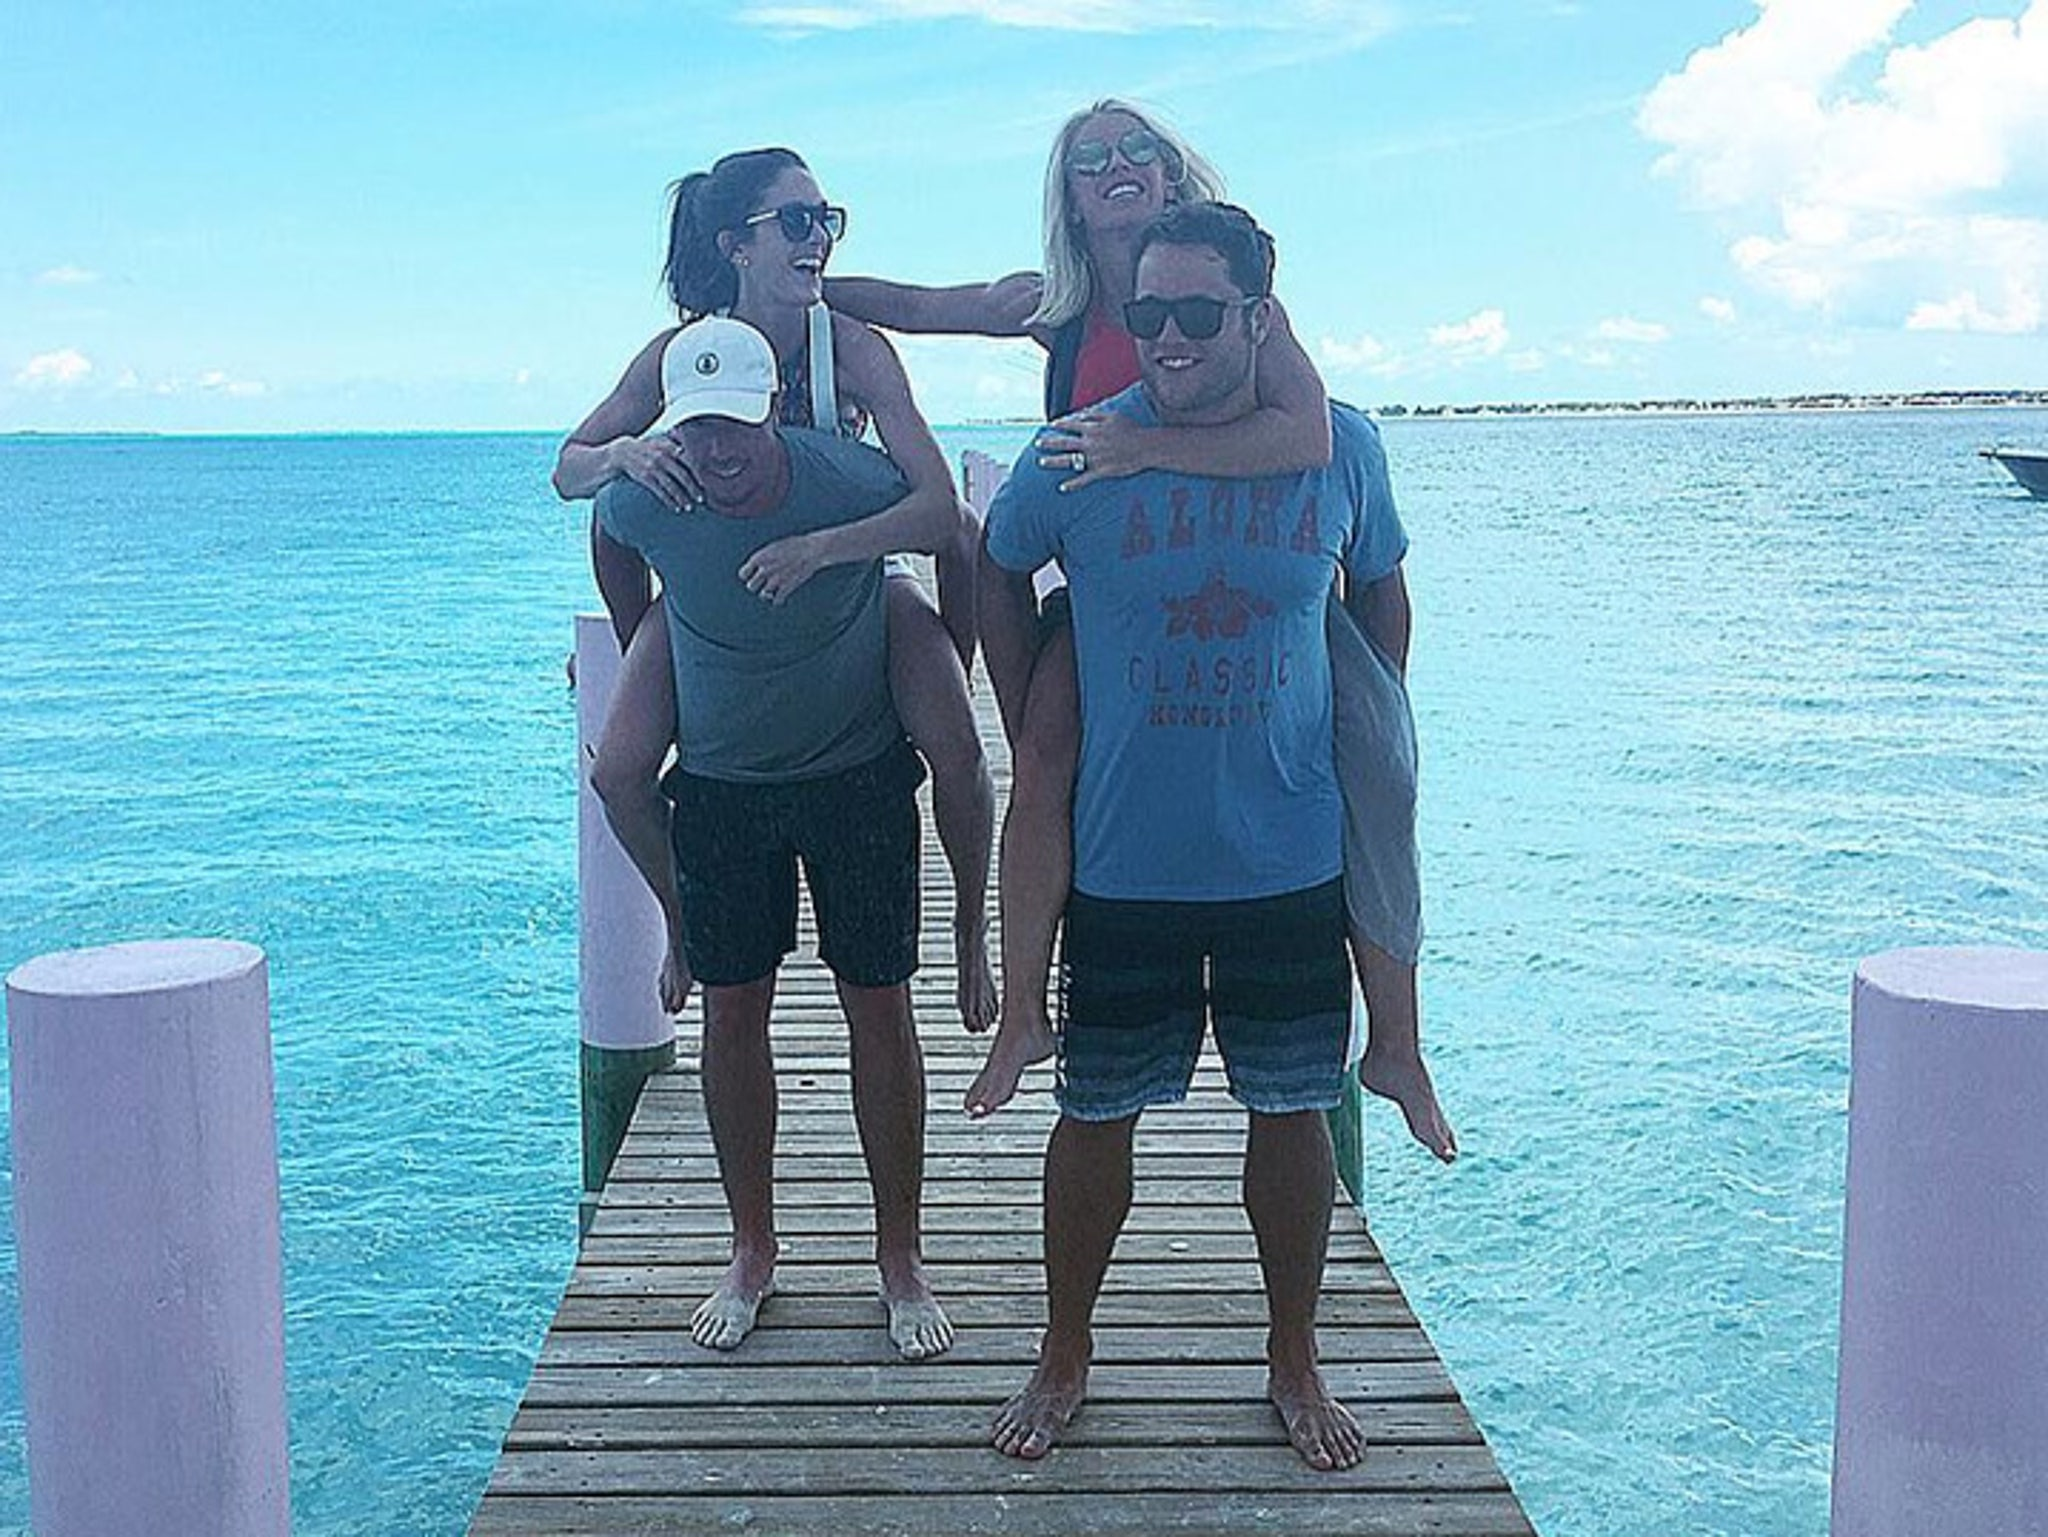 Nfl S Matt Stafford Couples Beach Vacation With Matt Ryan